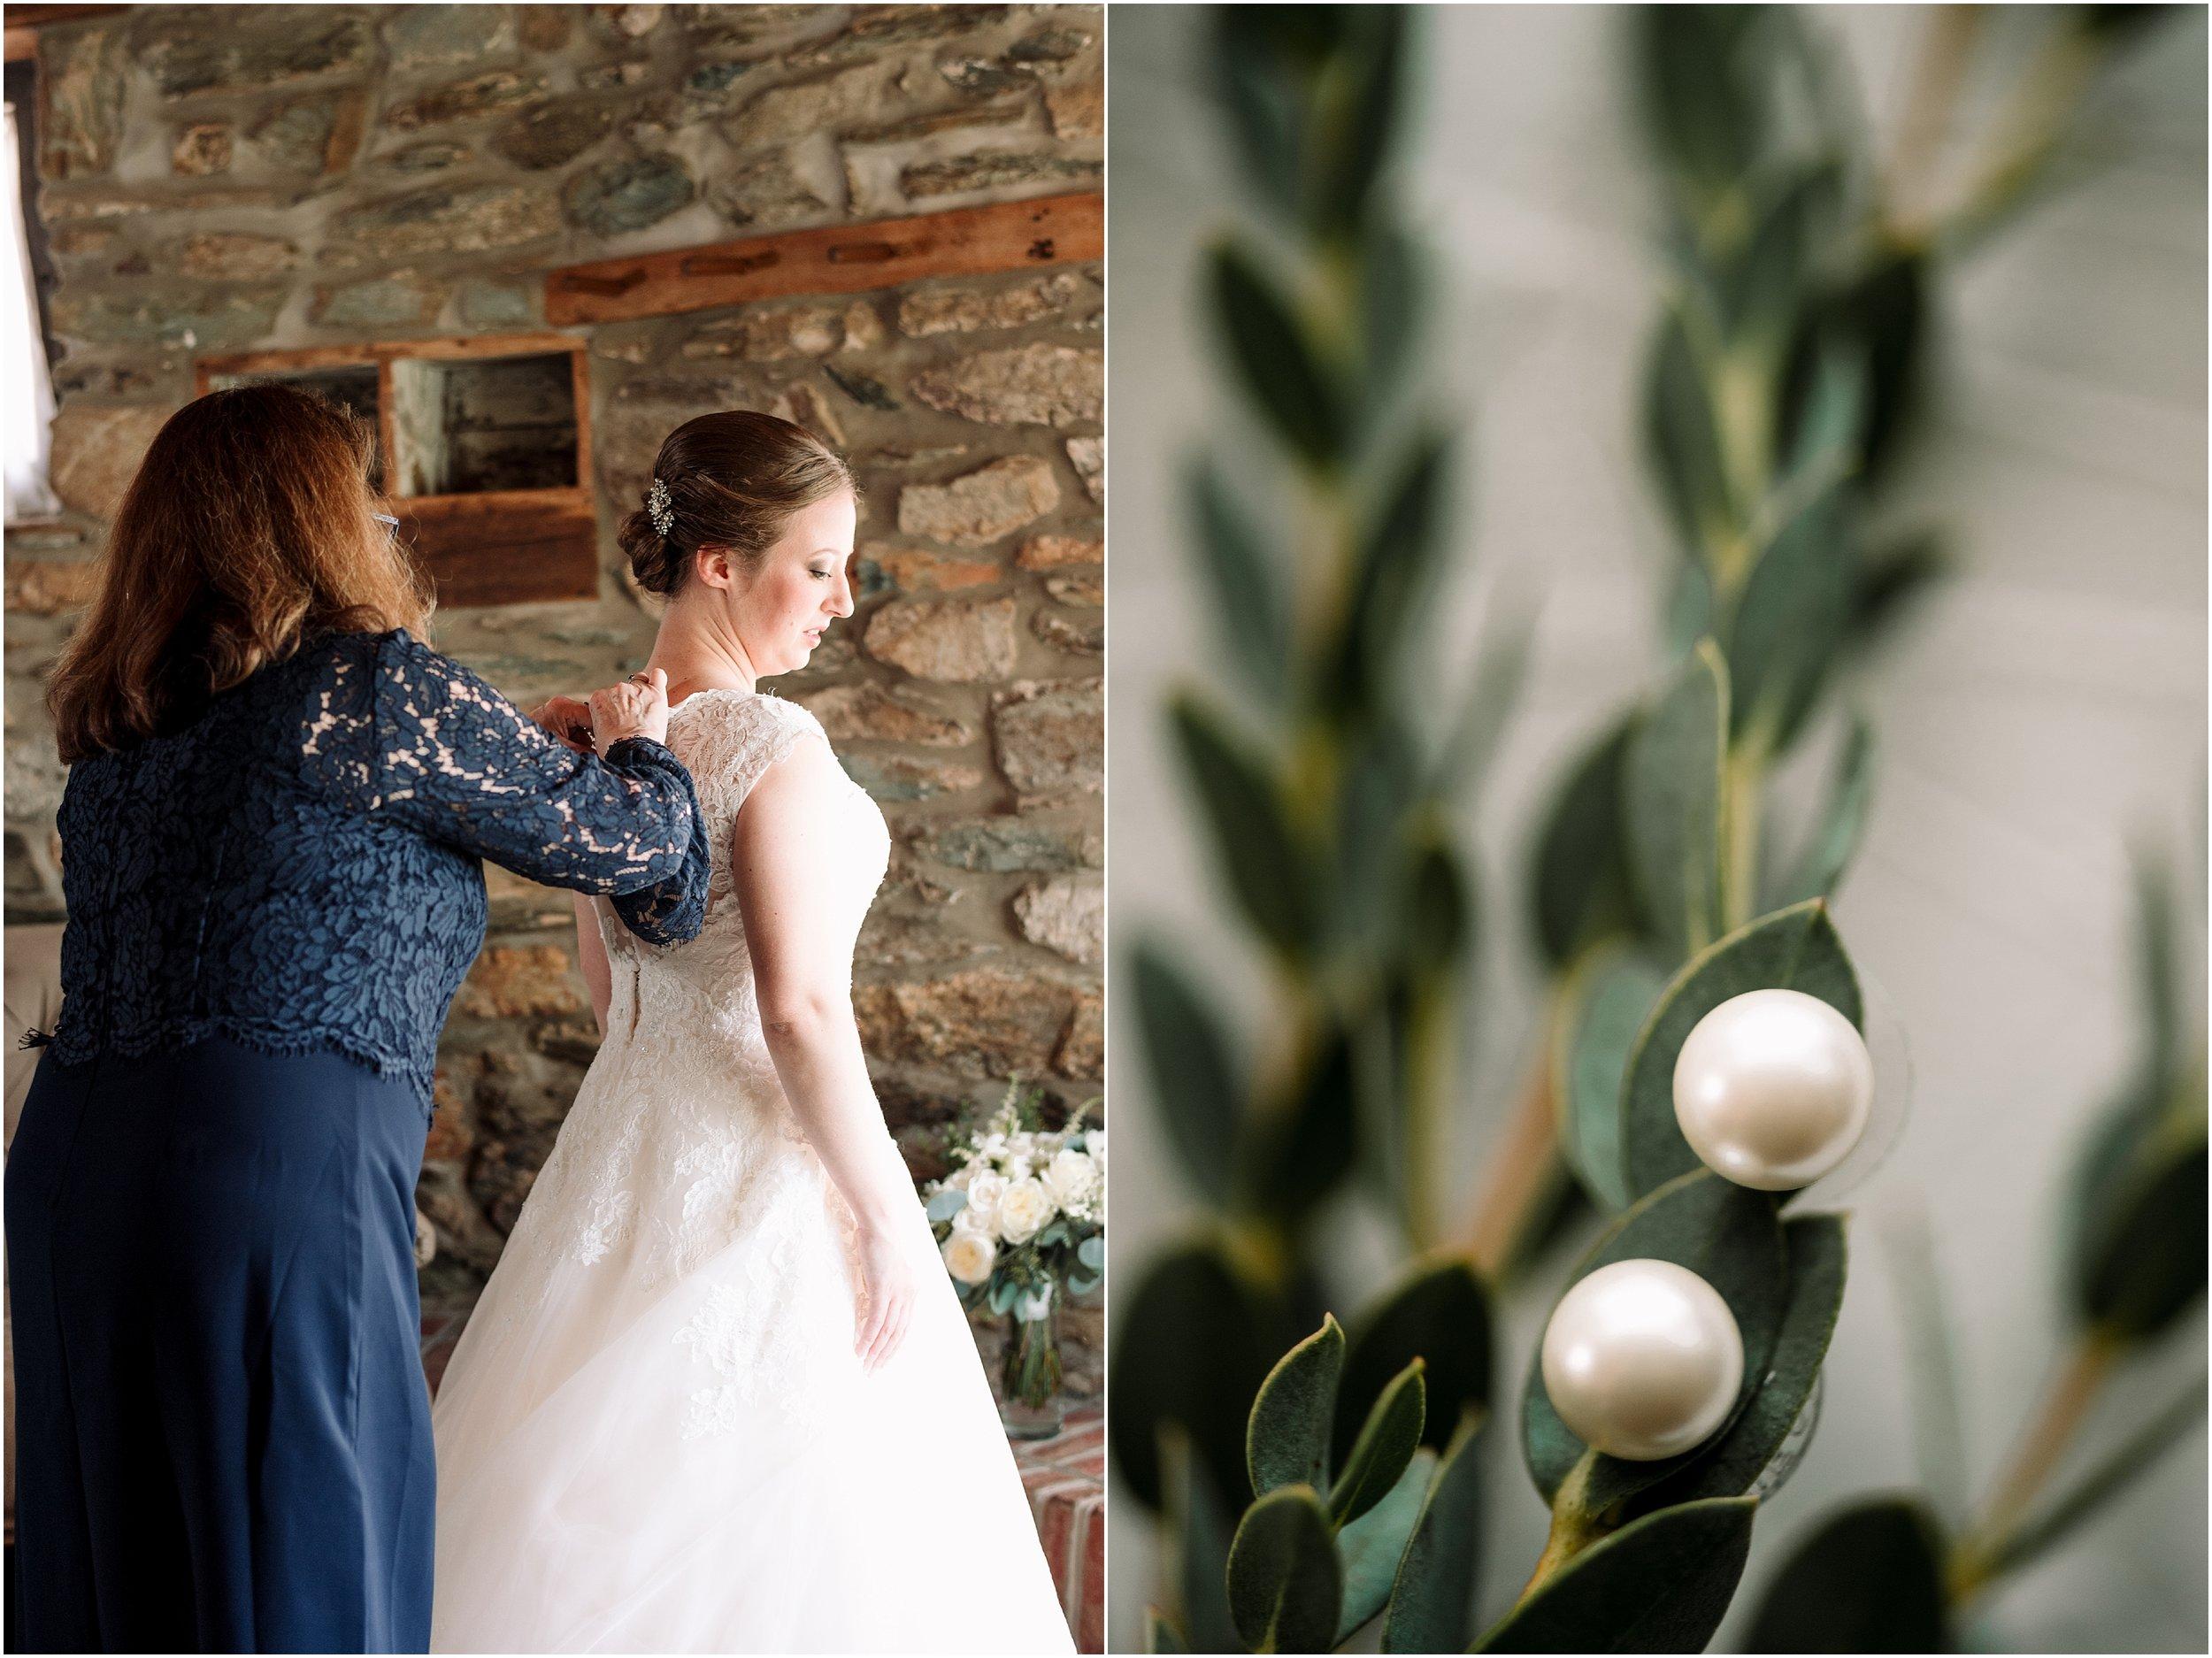 hannah leigh photography Wyndridge Farm Wedding York PA_1460.jpg